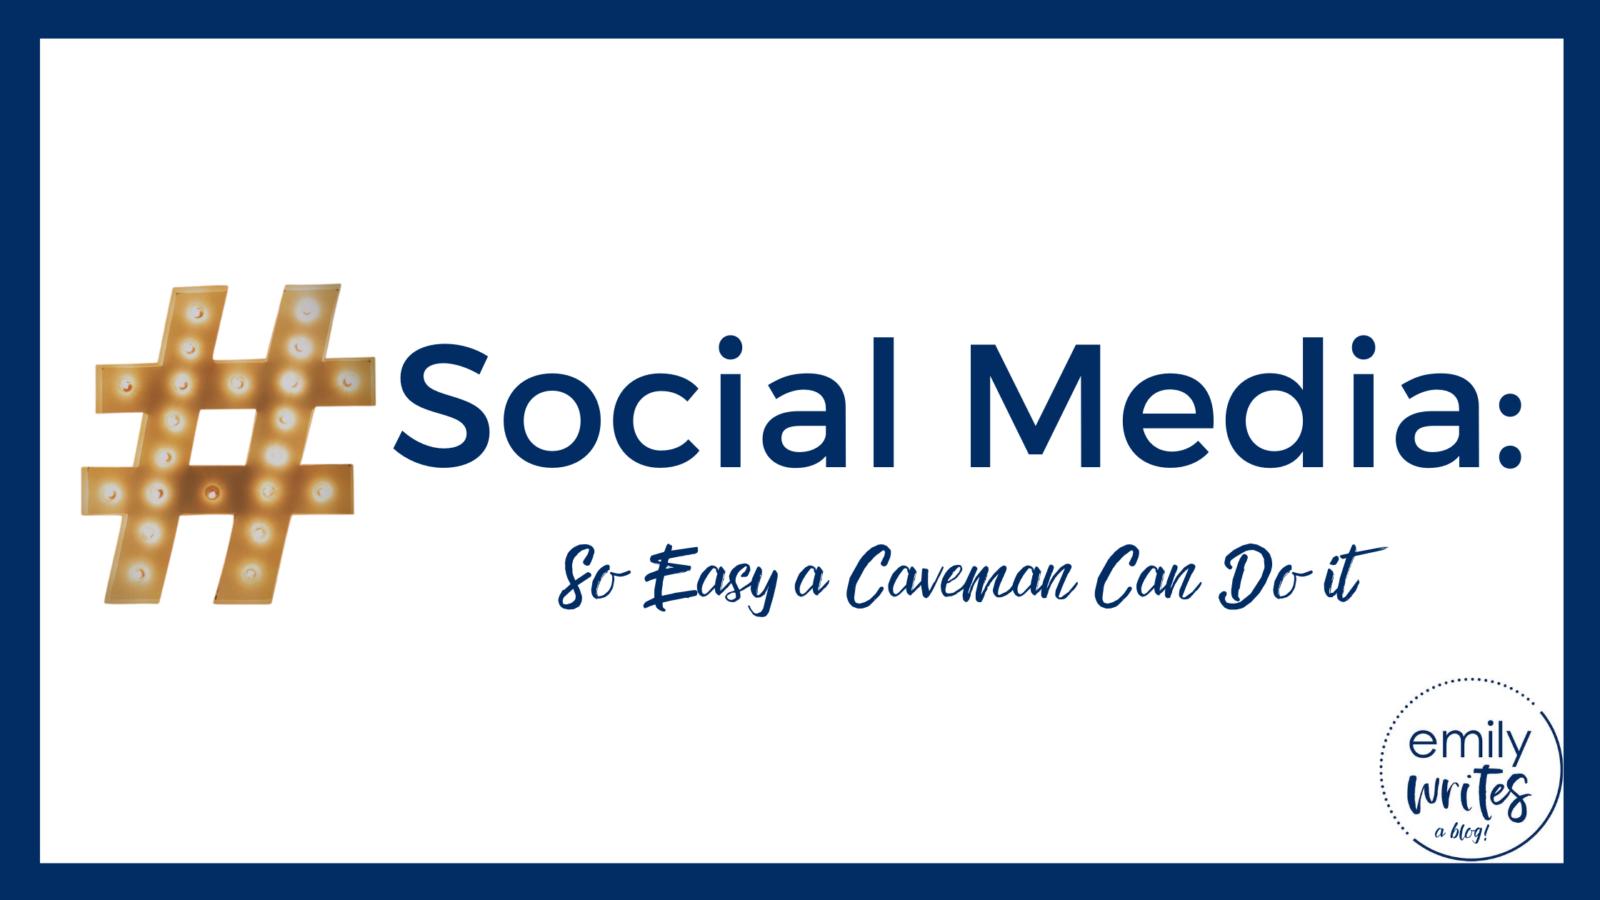 social media blog title